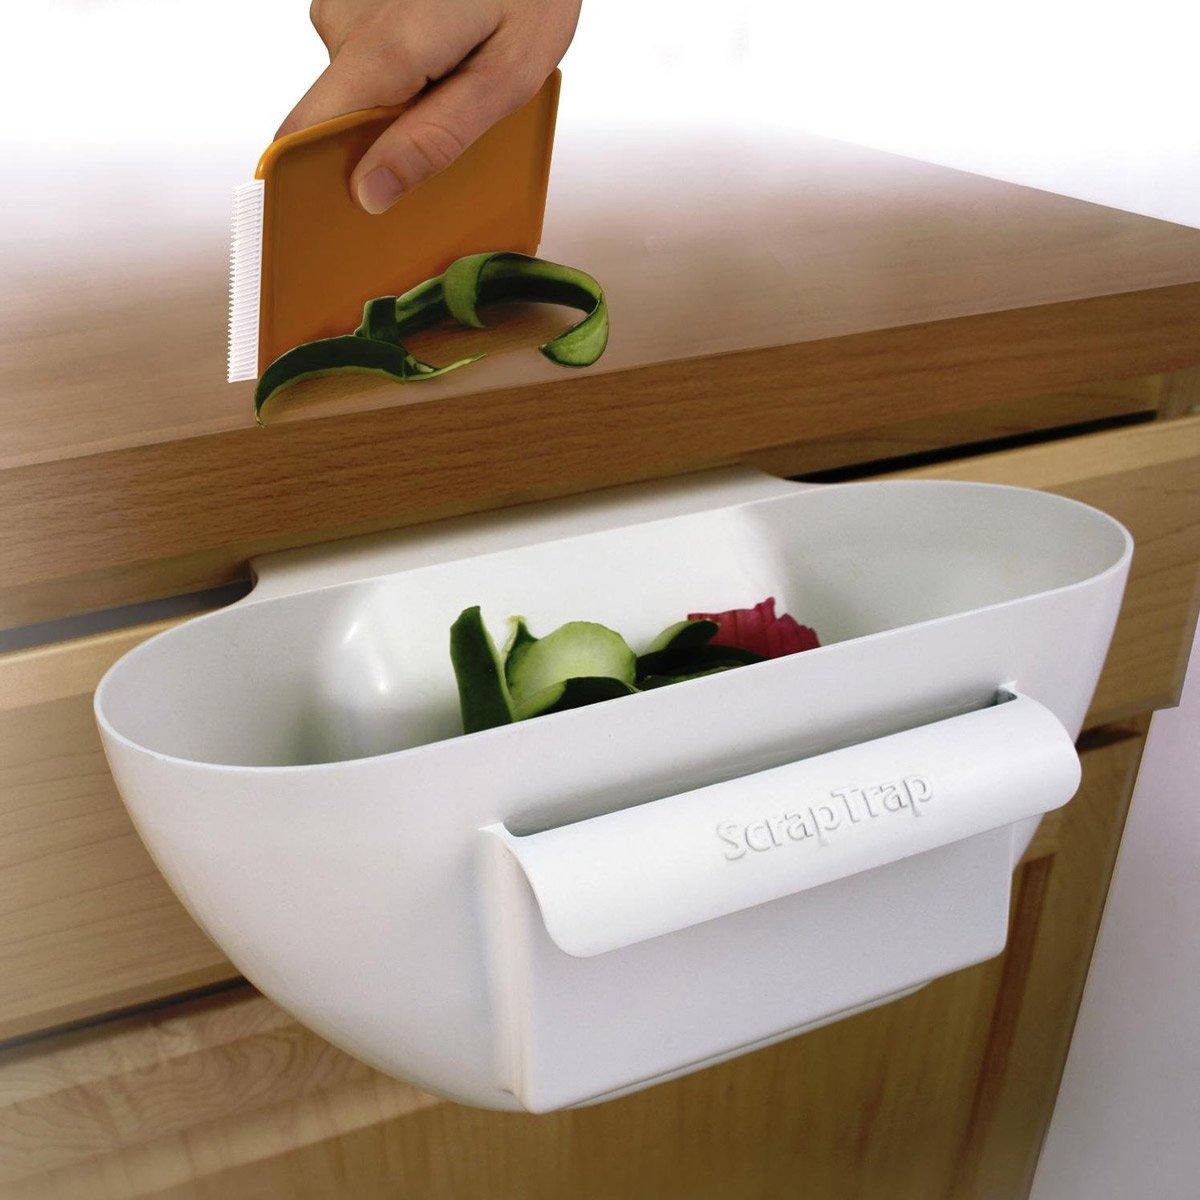 Scrap Trap Handy Kitchen Counter Scrap Bowl The Green Head